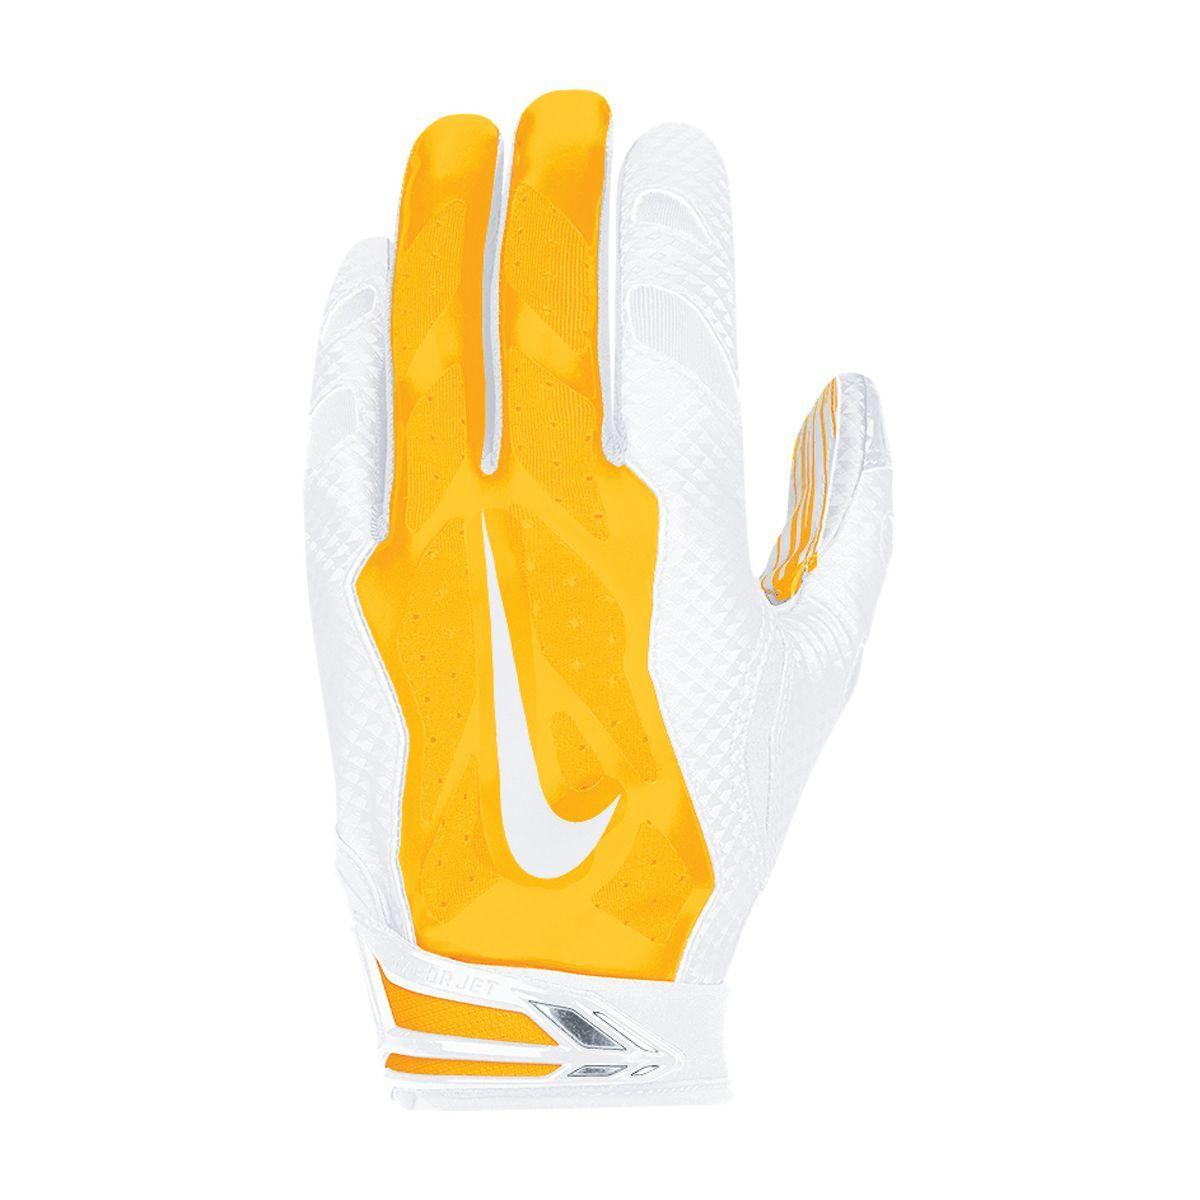 Nike Football Gloves Yellow: Nike Vapor Jet 3.0 American Football Gloves